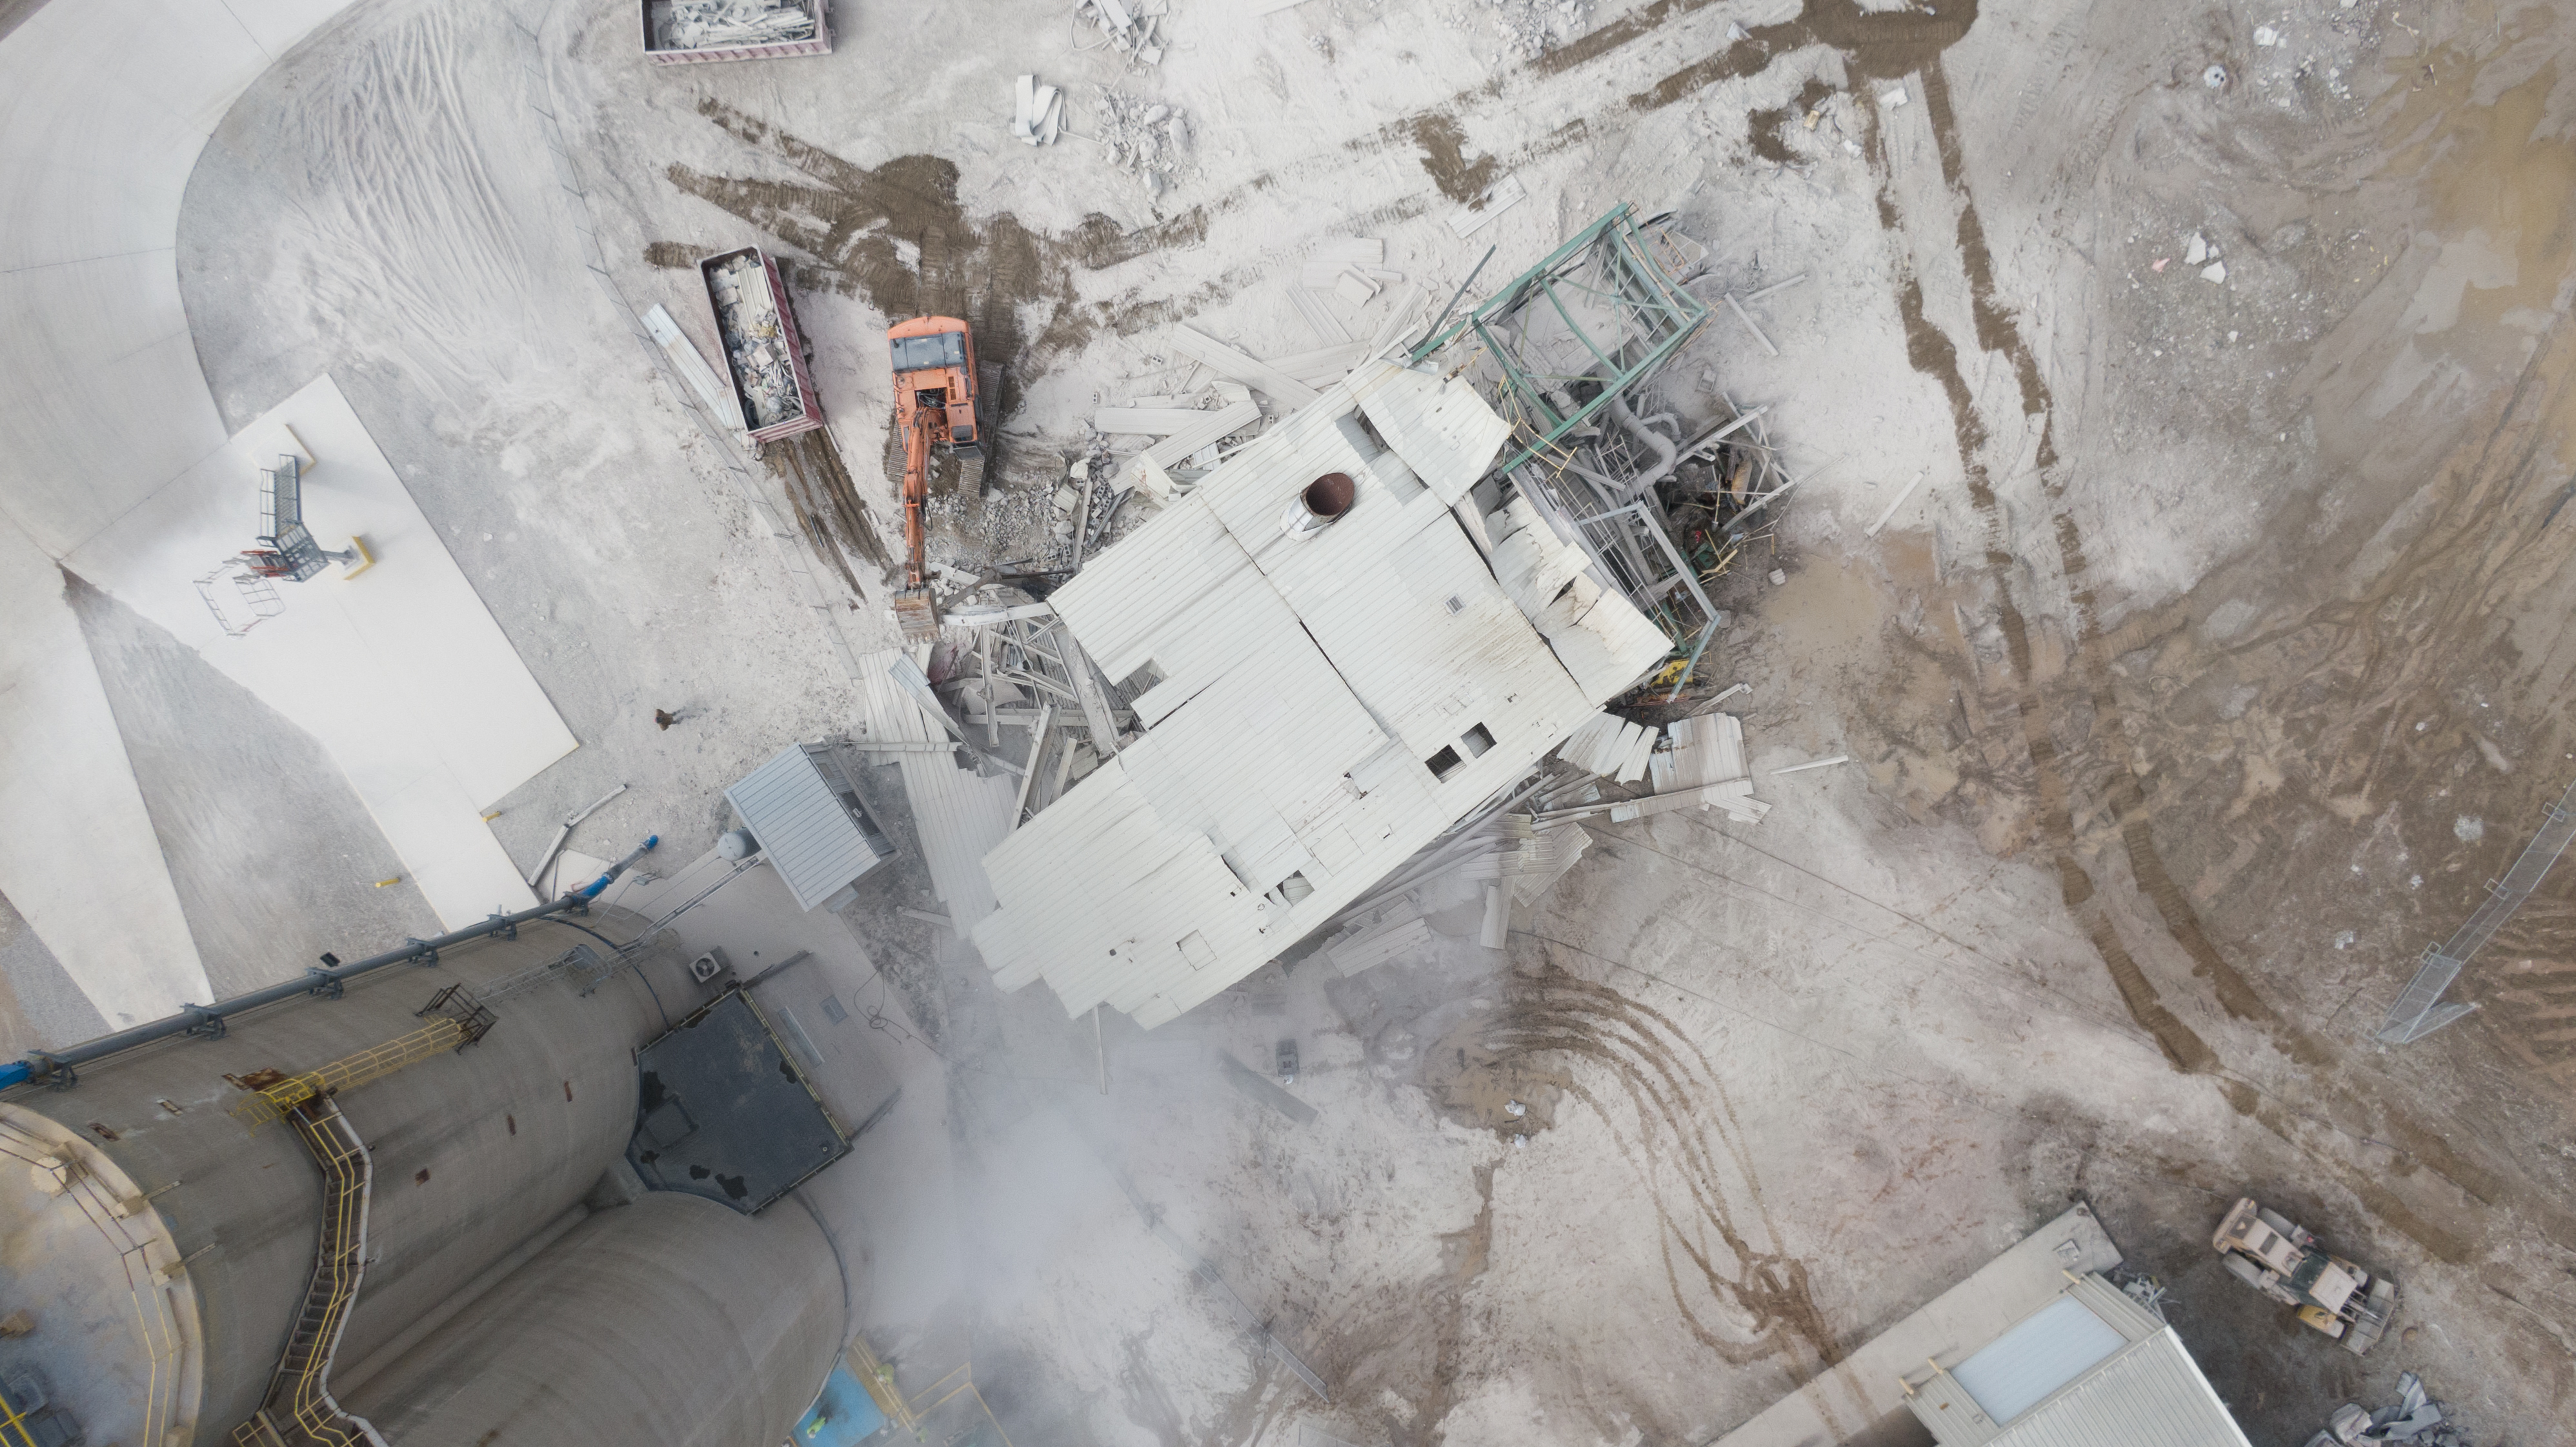 scm-demolition-pull-building-0419